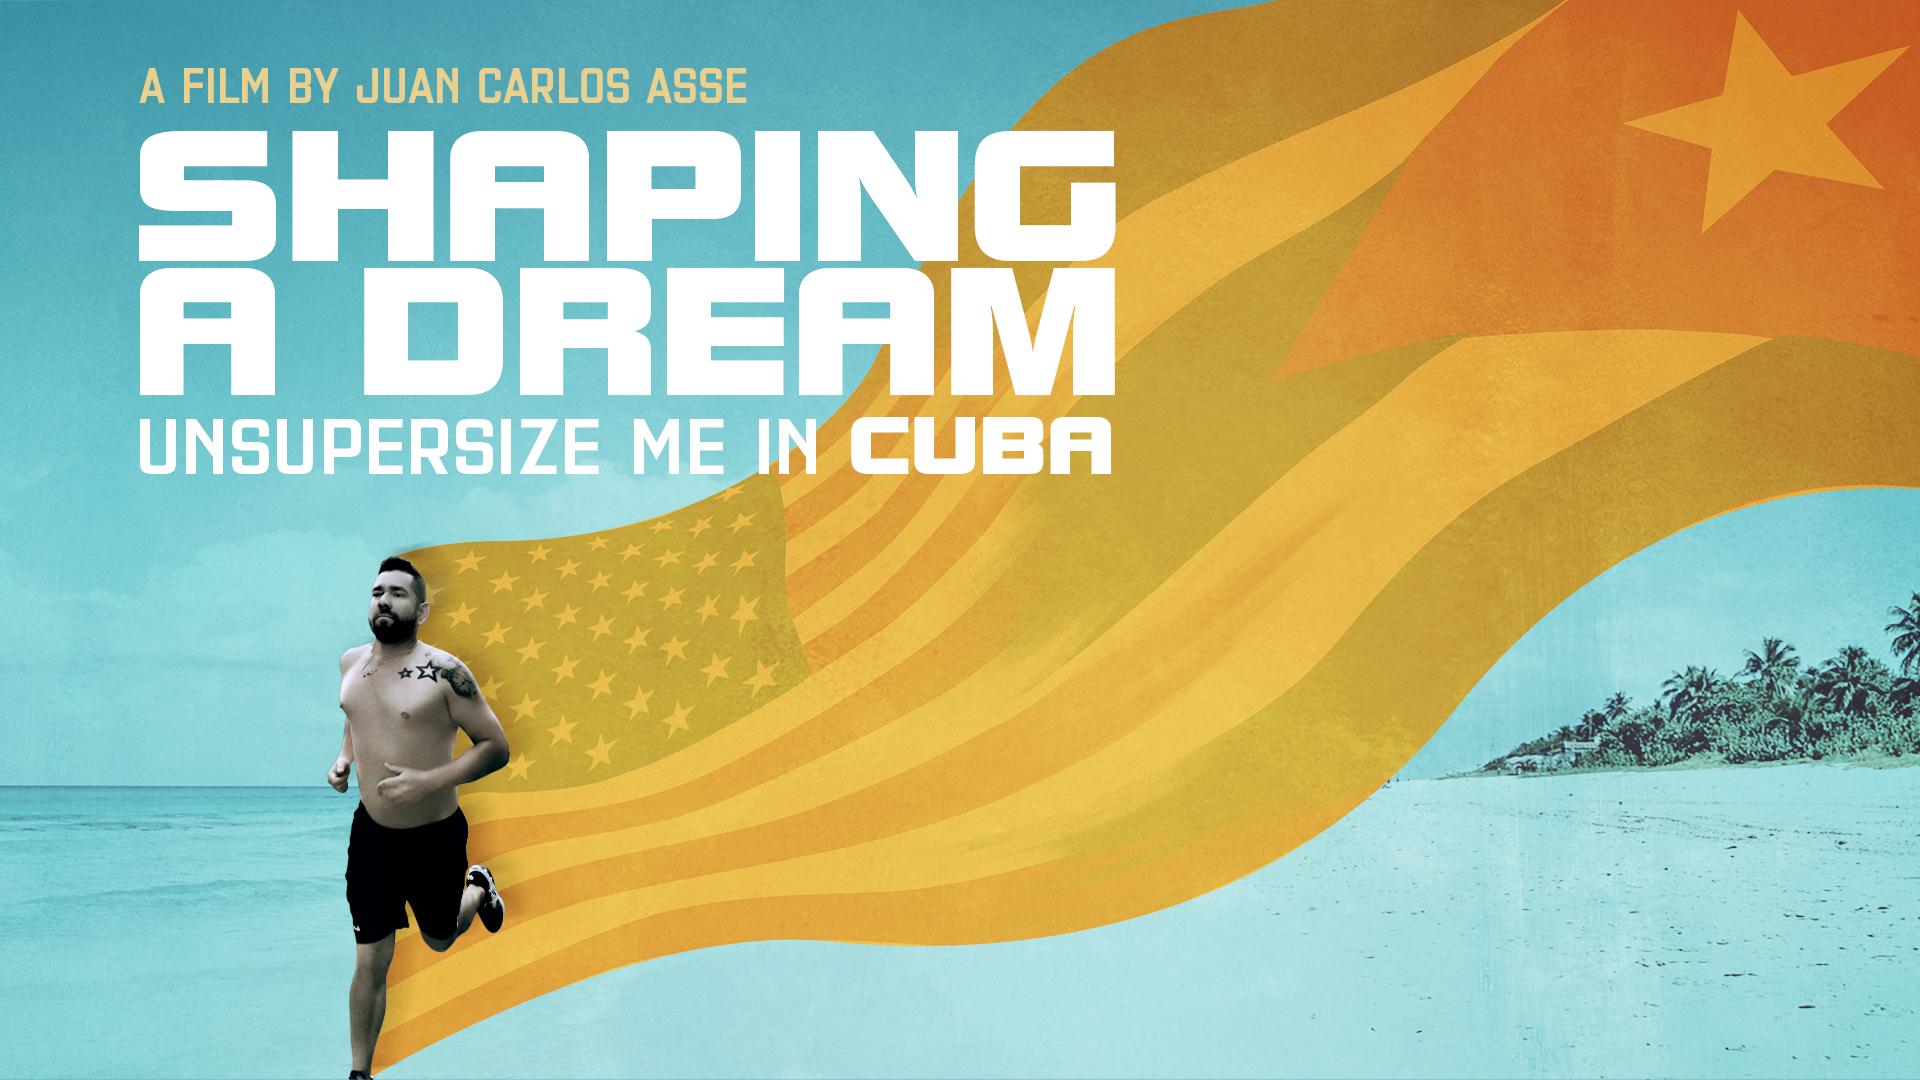 Realizando Un Sueno Unsupersized Me En Cuba on Amazon Prime Instant Video UK